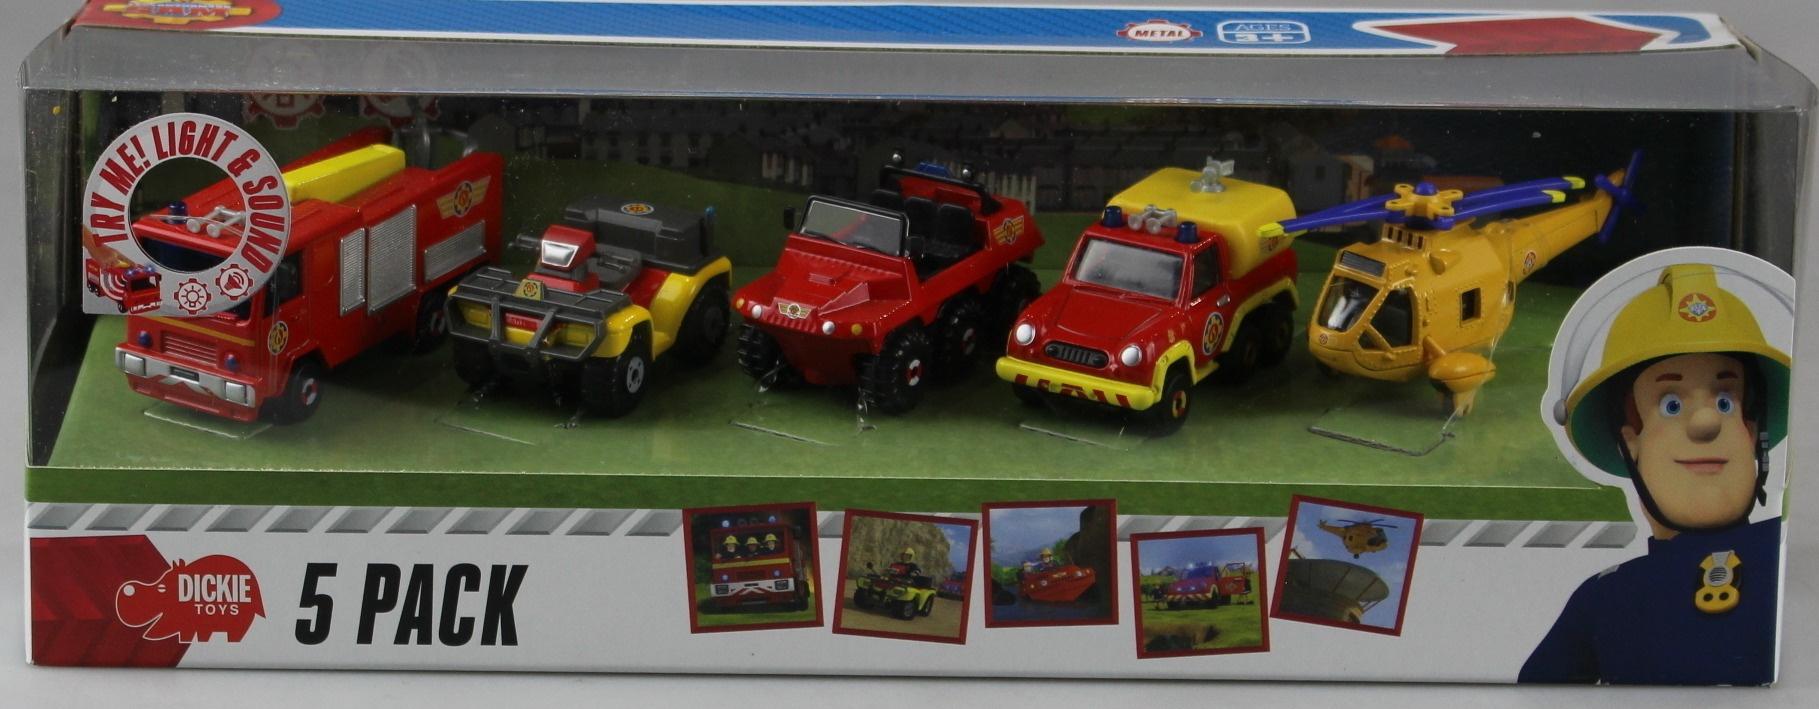 DICKIE TOYS 203094002 Fireman Sam Vehicles Set